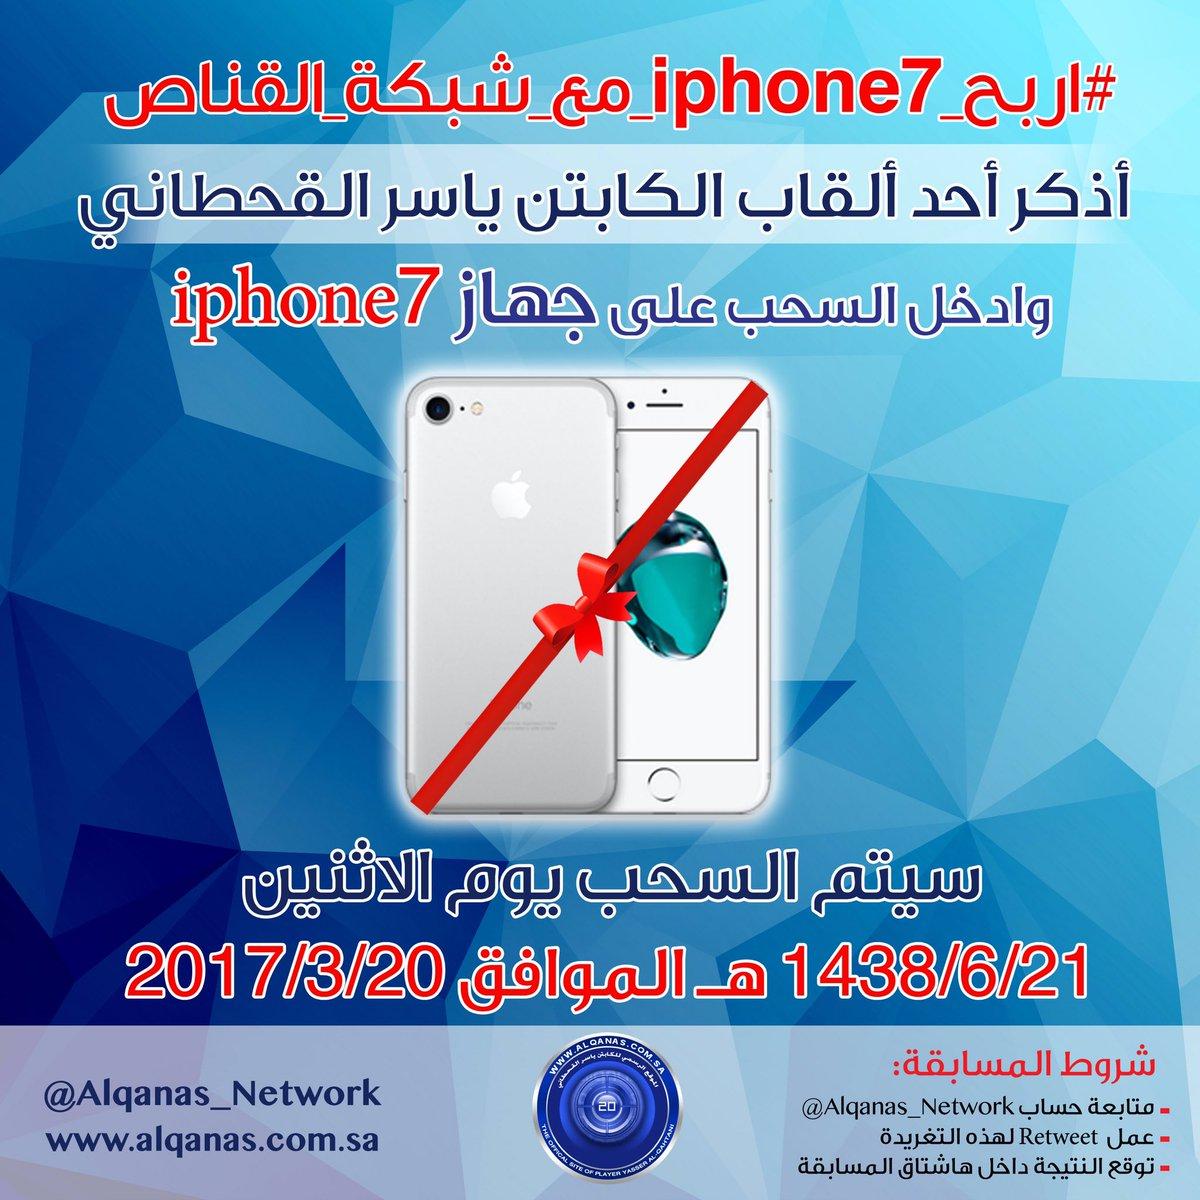 129d2b8df #اربح_iphone7_مع_شبكة_القناصpic.twitter.com/Njqz7kdpXH